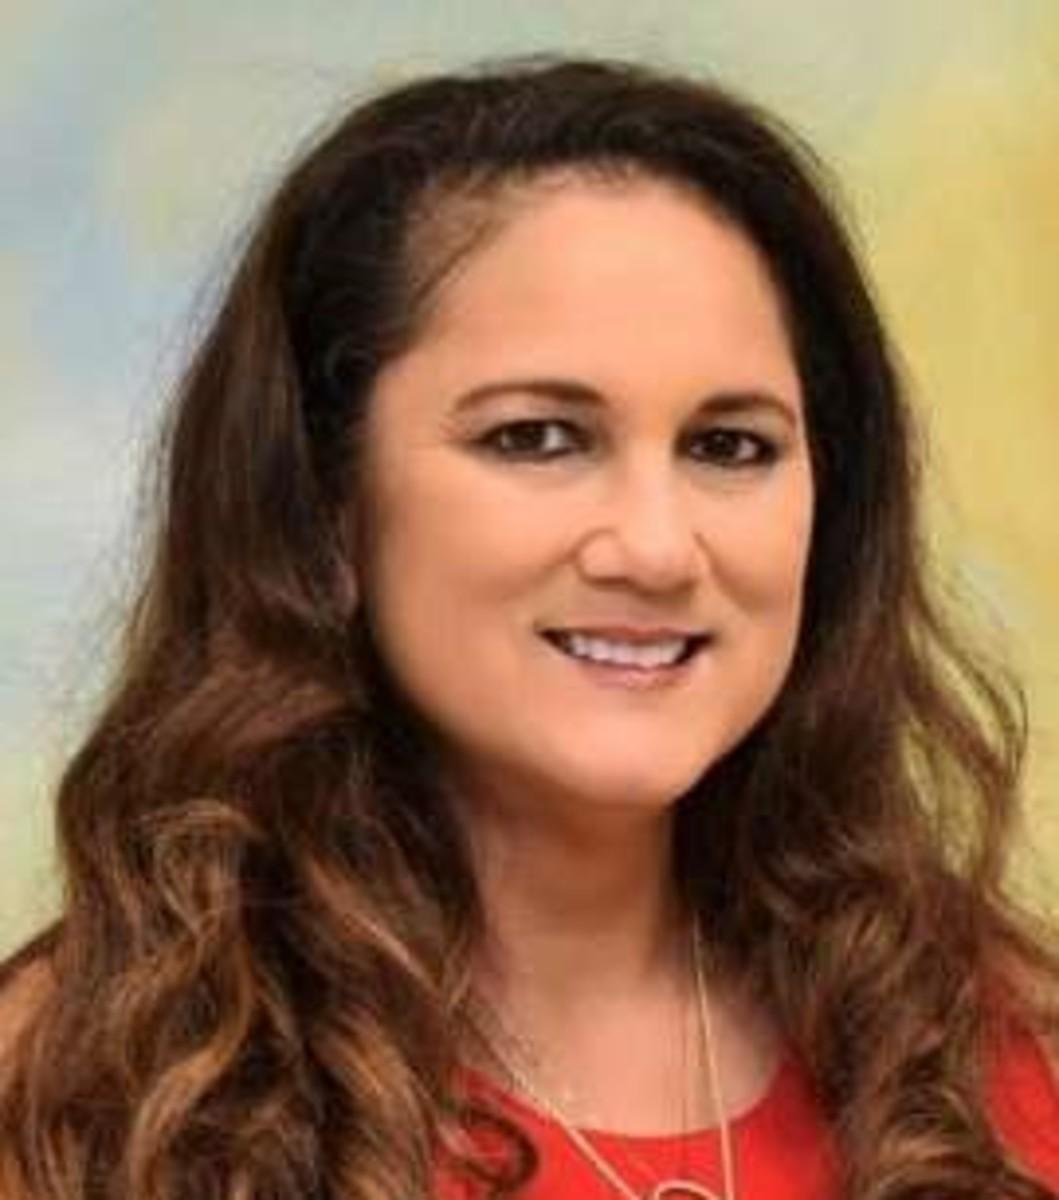 Brenda Nagelhout- Olivarez. Employed at Edgewood ISD. Candidate for Southside IS School Board. Position 6